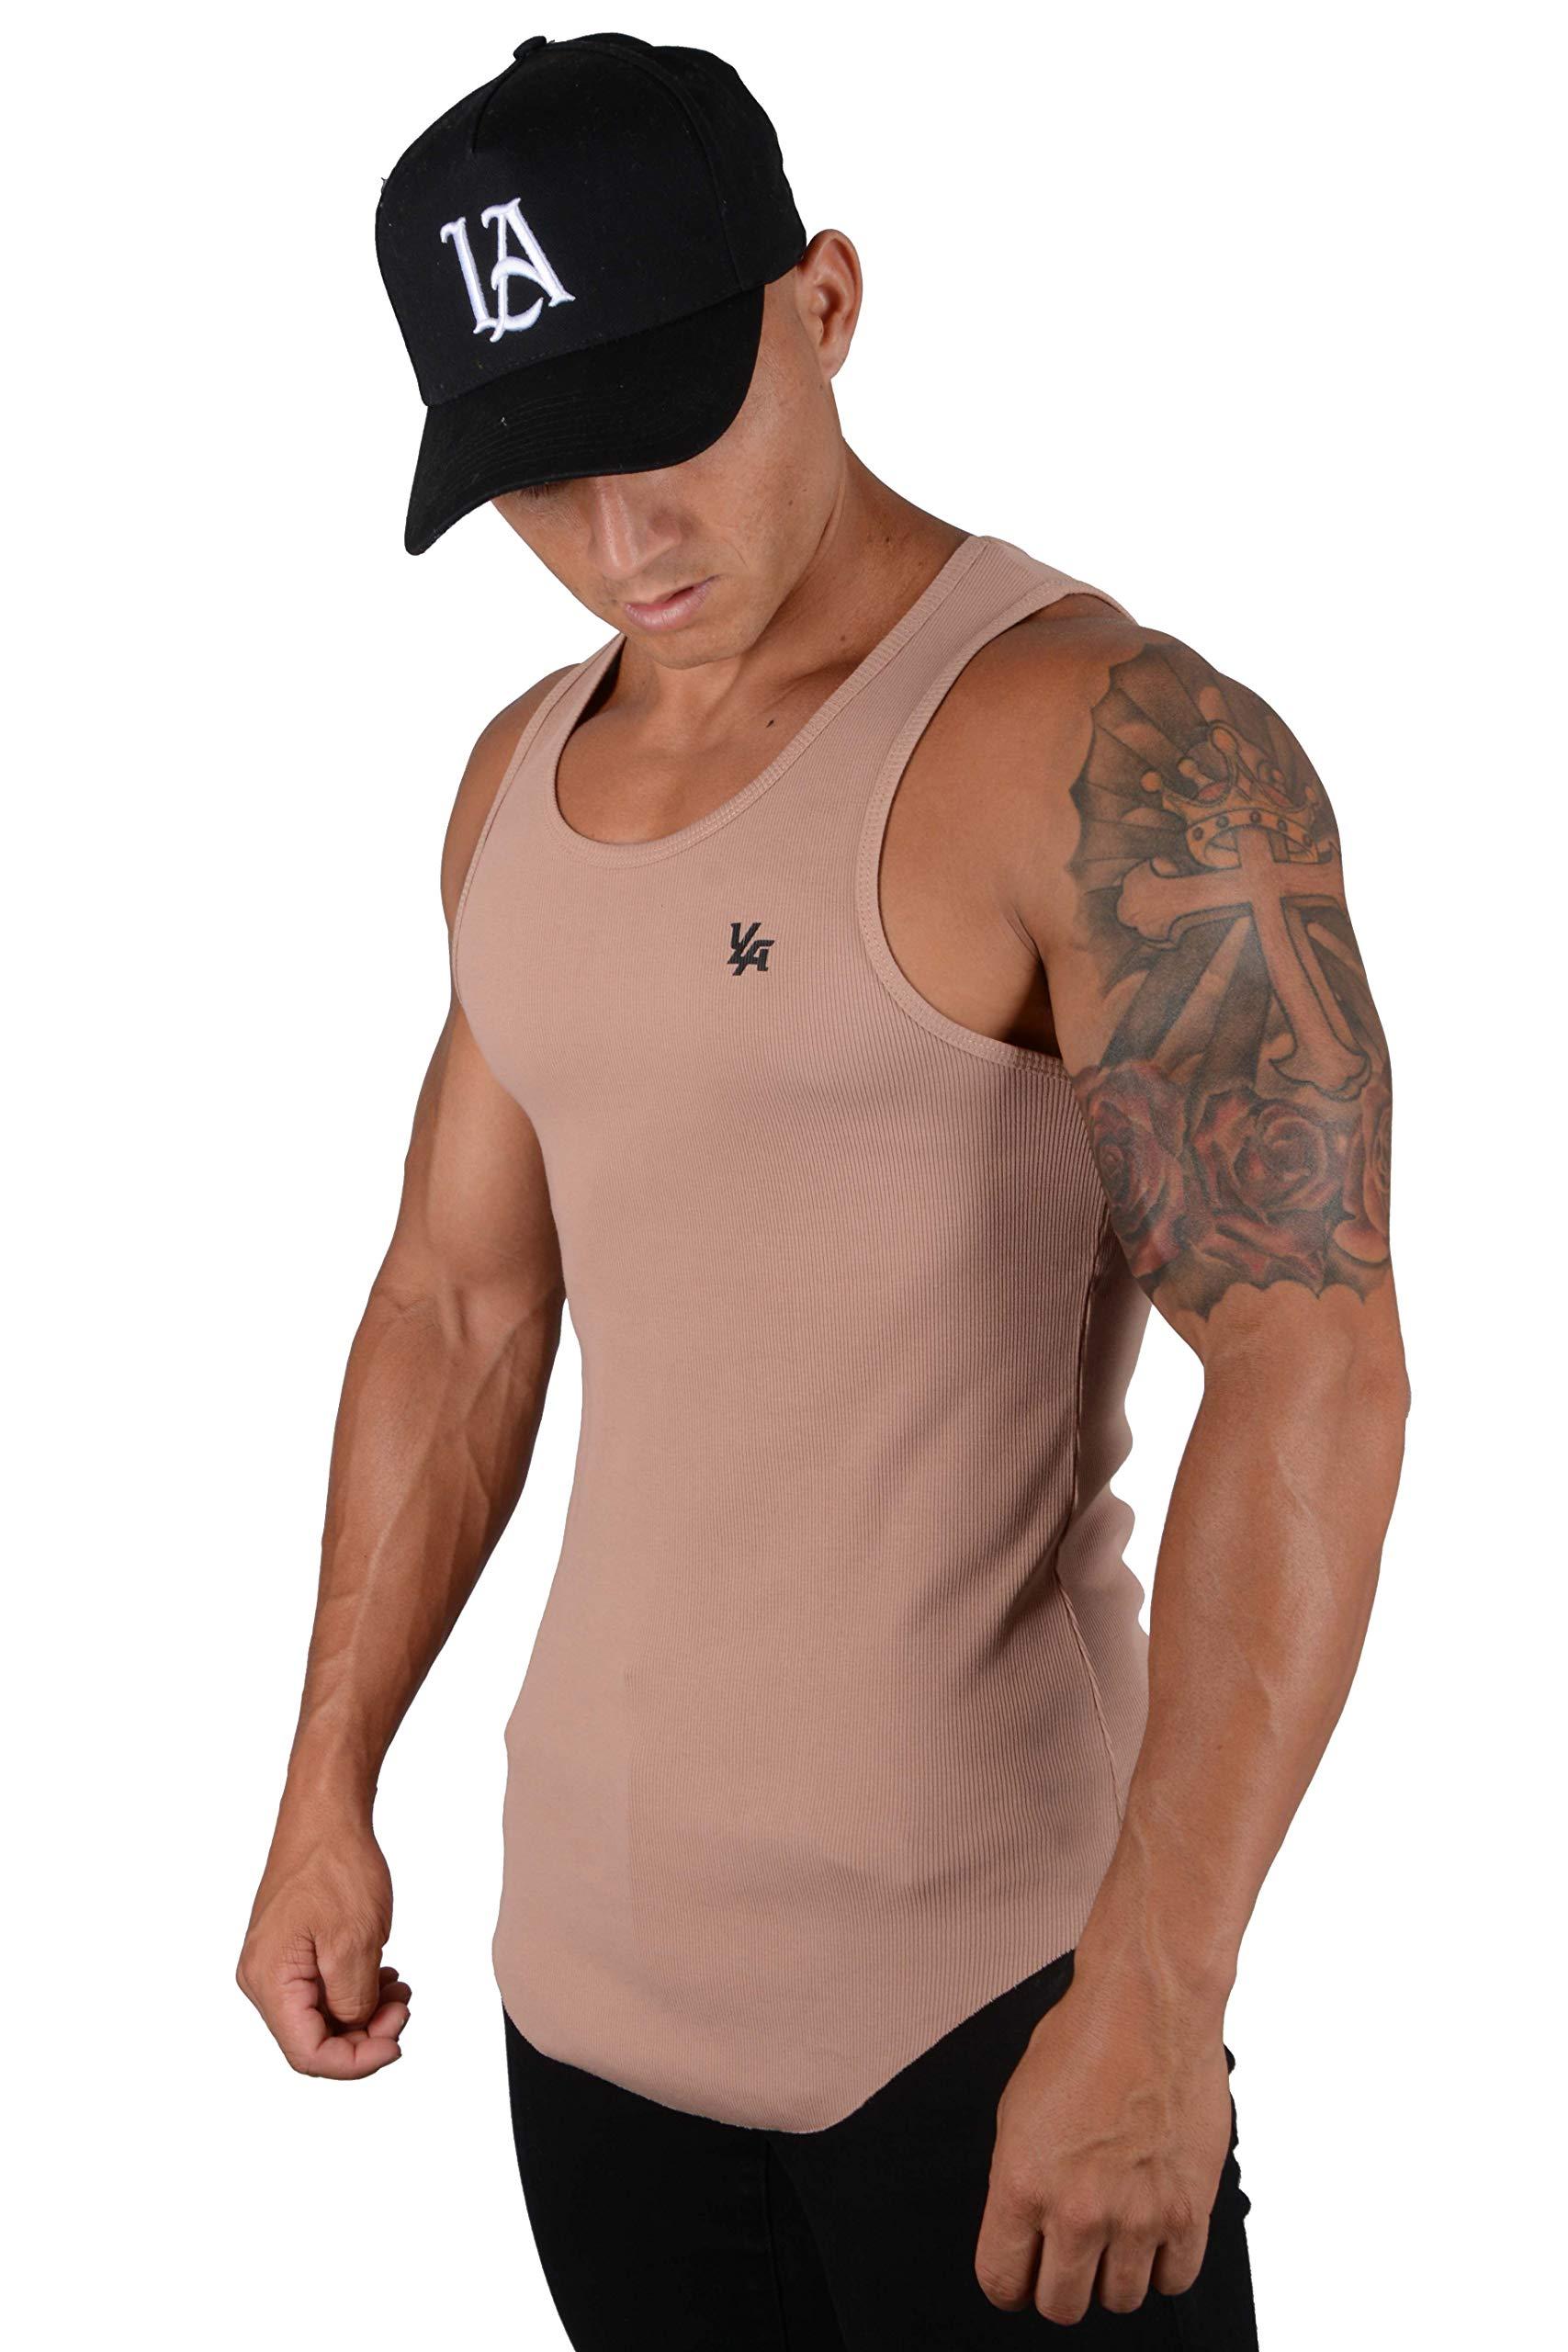 YoungLA Tank Tops Men Workout Muscle Shirts Gym Bodybuilding 314